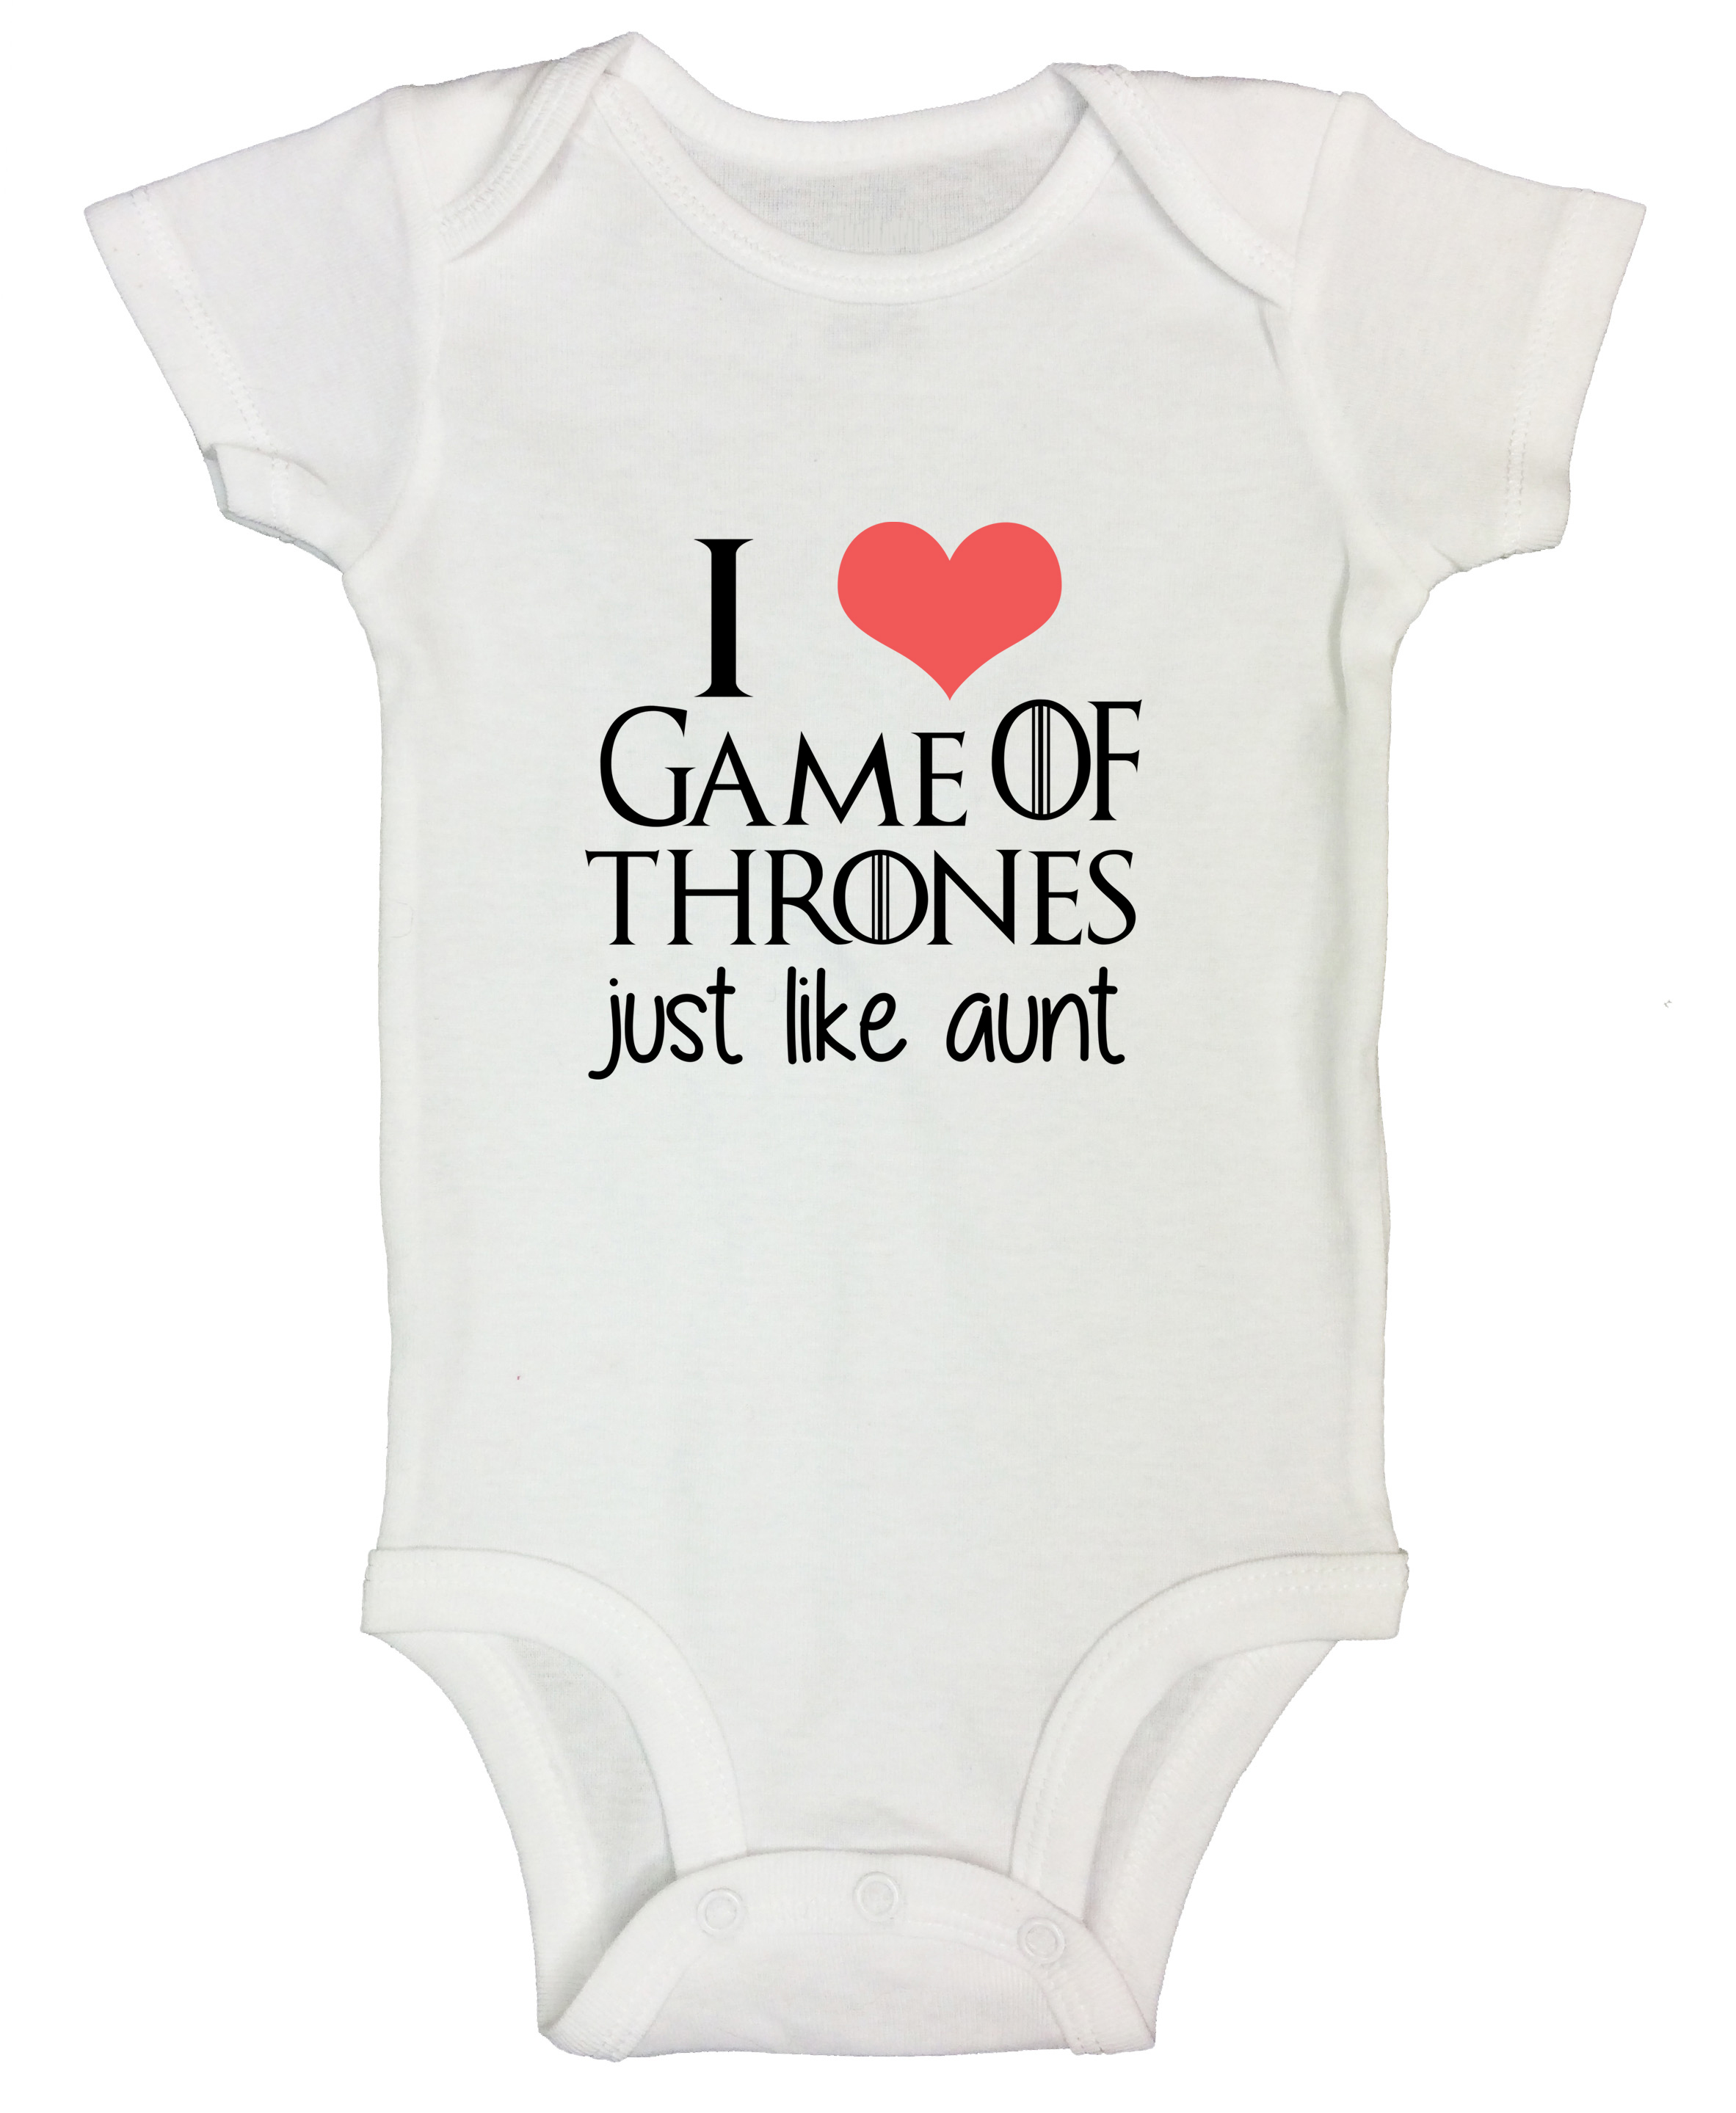 "b3f9d7a17e20f Game Of Thrones Onesie Kids Bodysuit ""I Love Game Of Thrones Just Like  Aunt"" 0-Newborn, White - Walmart.com"